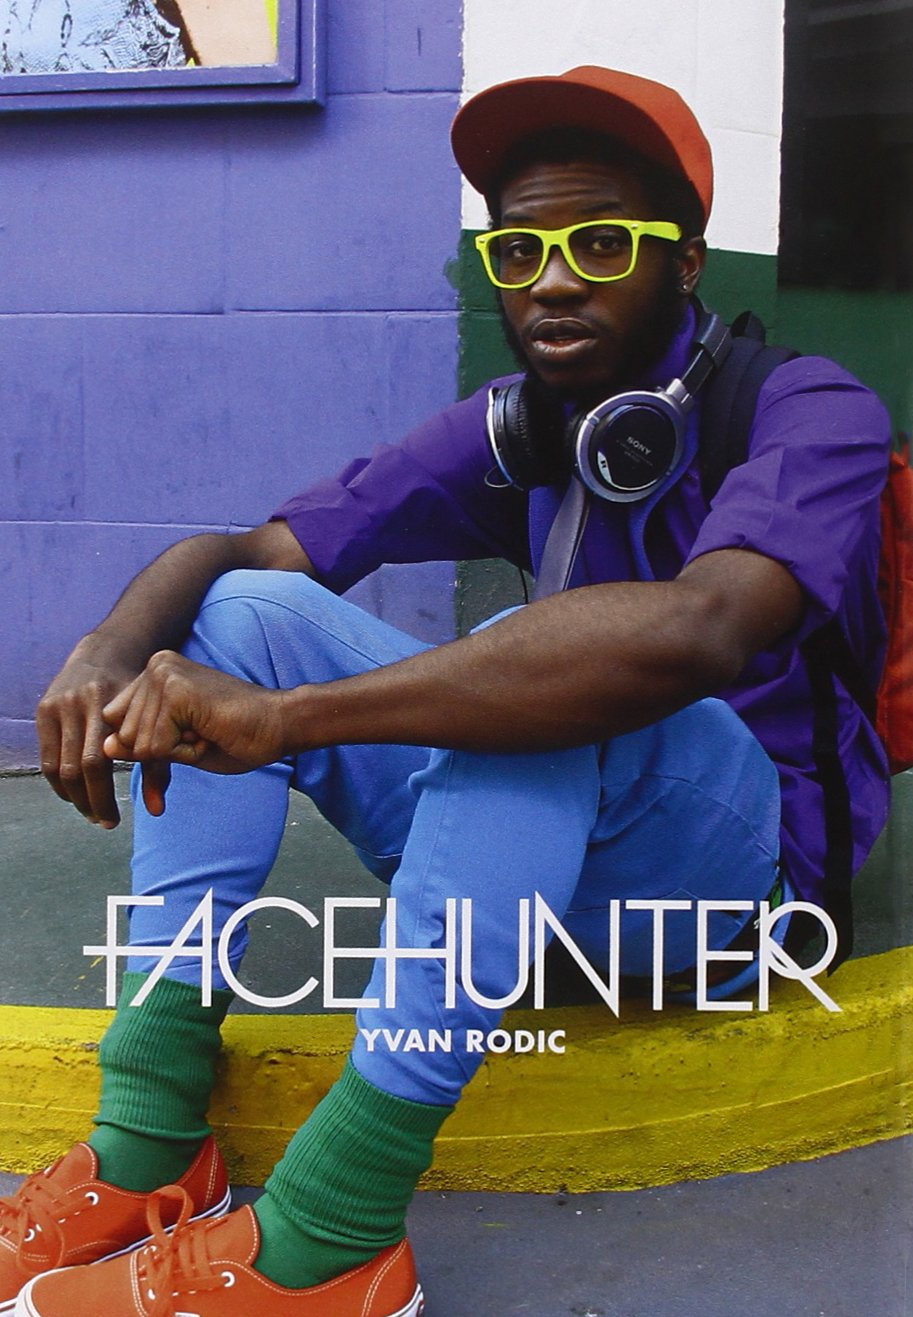 Facehunter: The Book pics